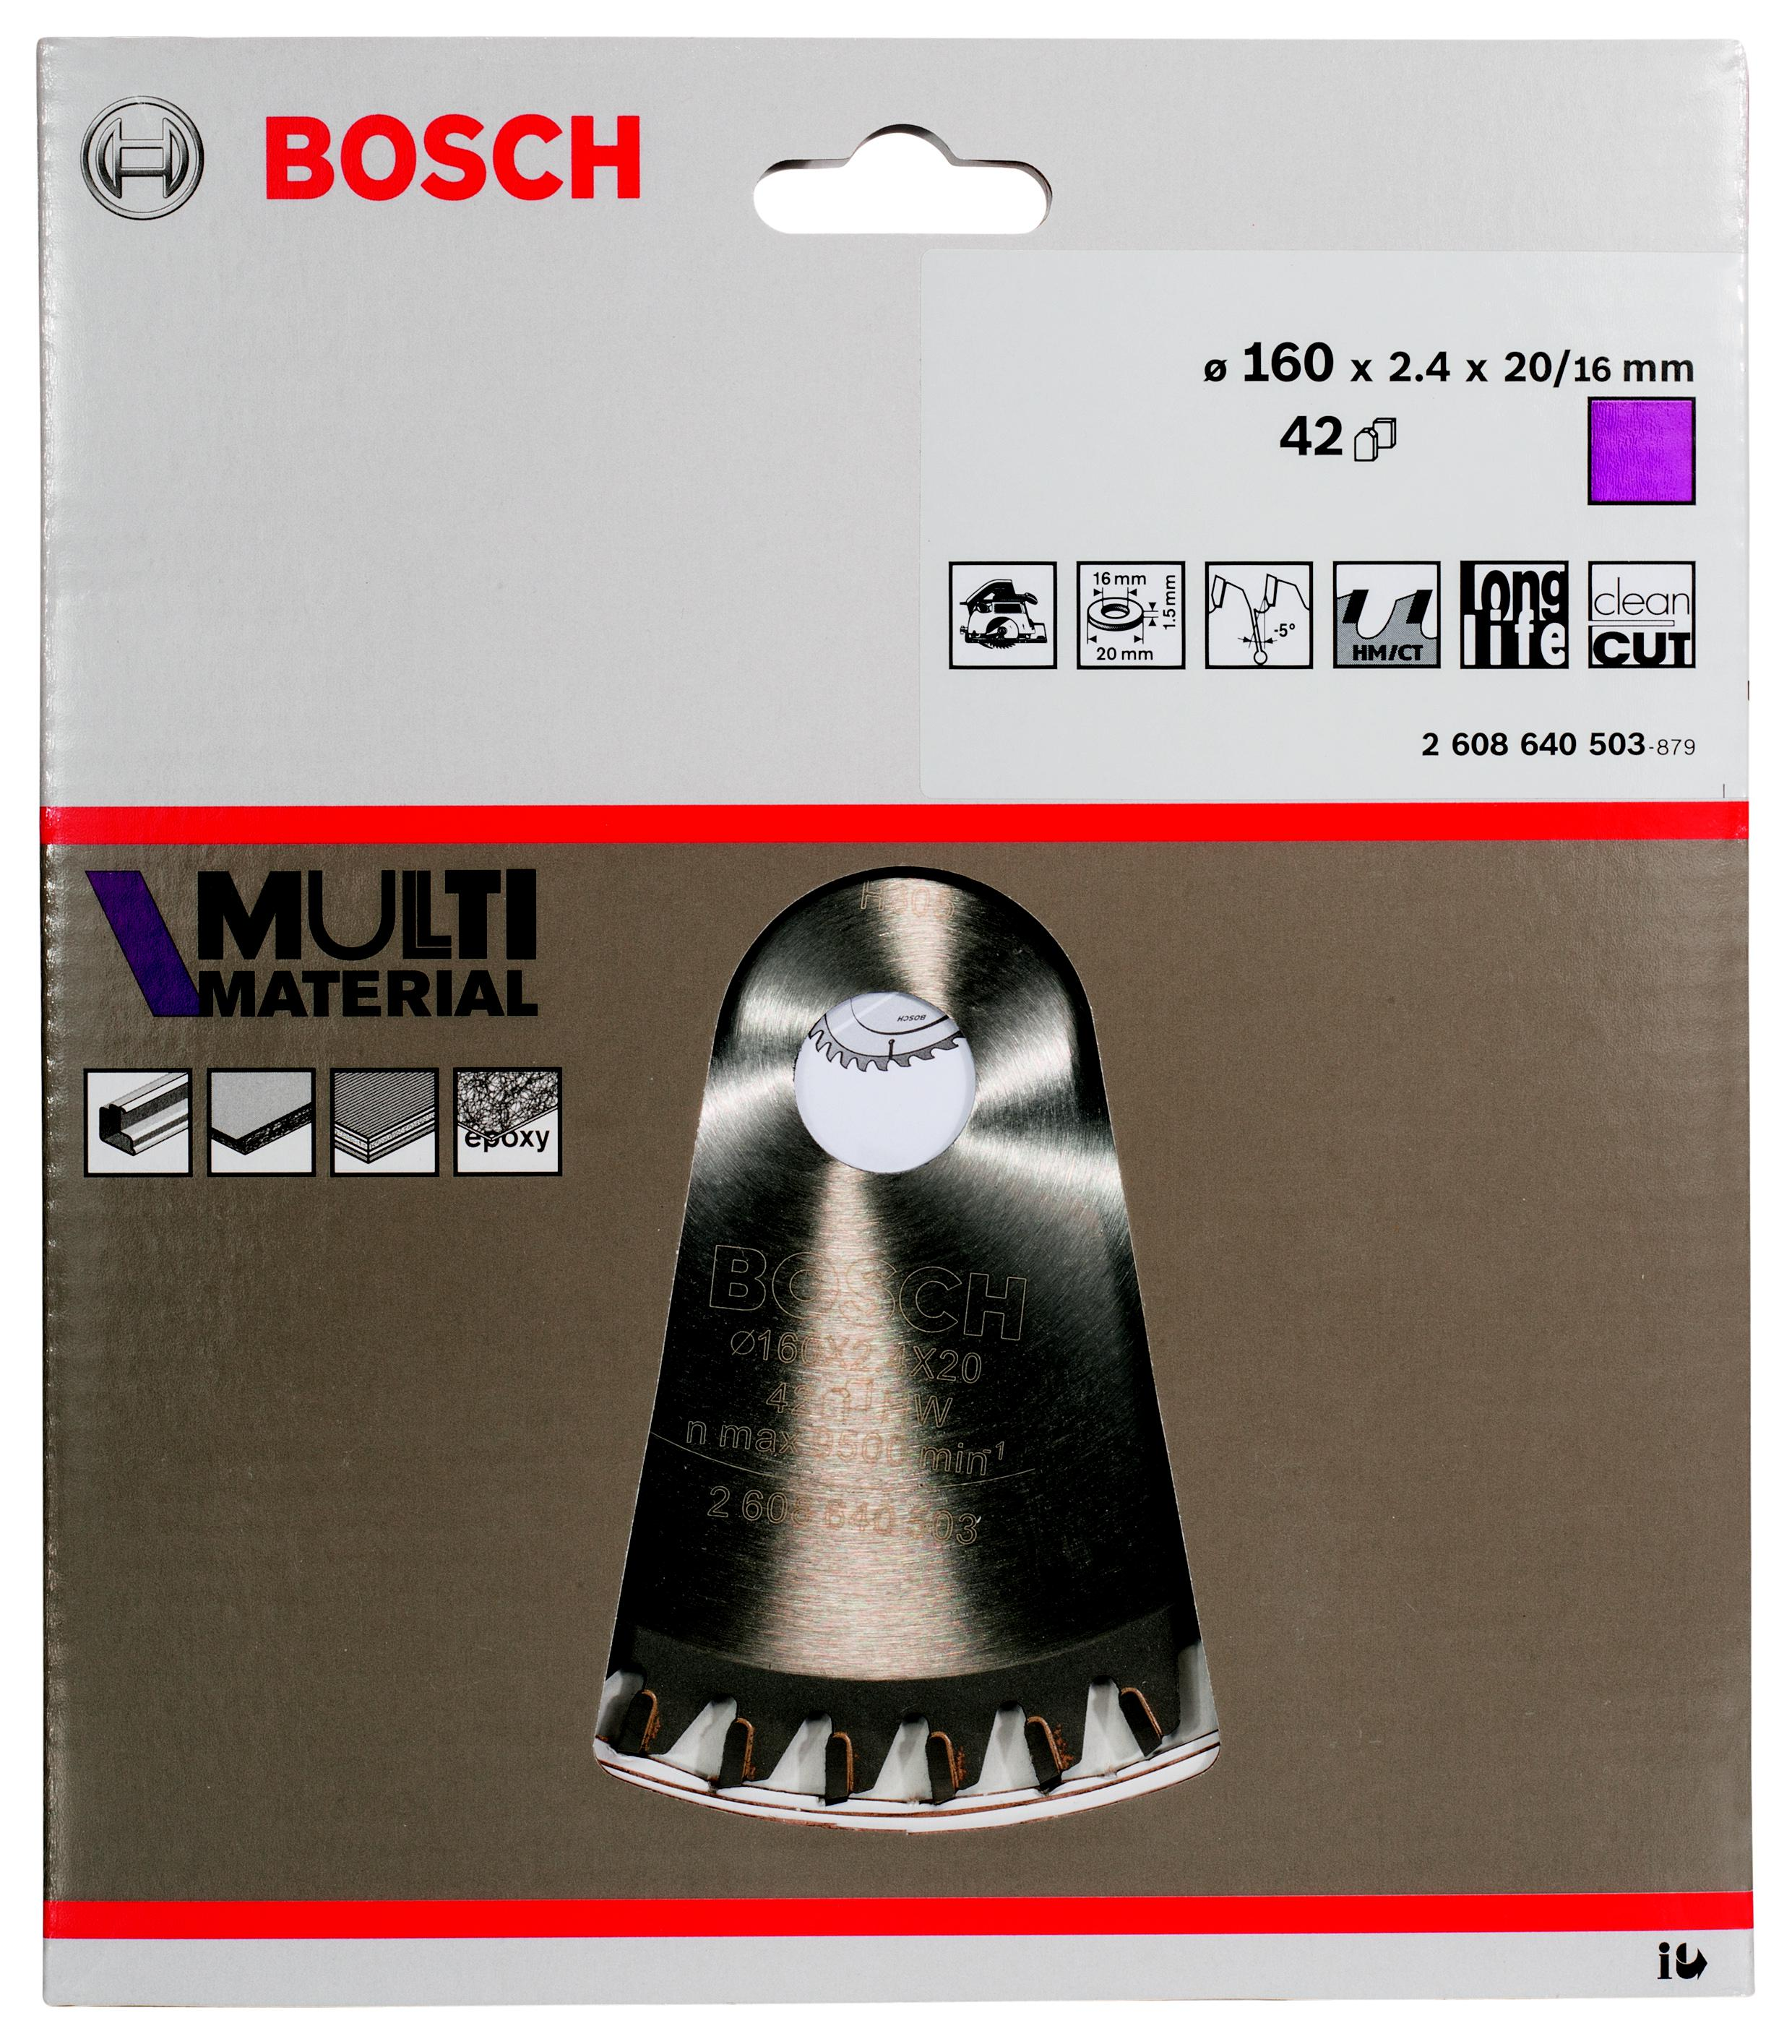 Диск пильный твердосплавный Bosch Multi material 160x42x20/16 (2.608.640.503) bioinert material